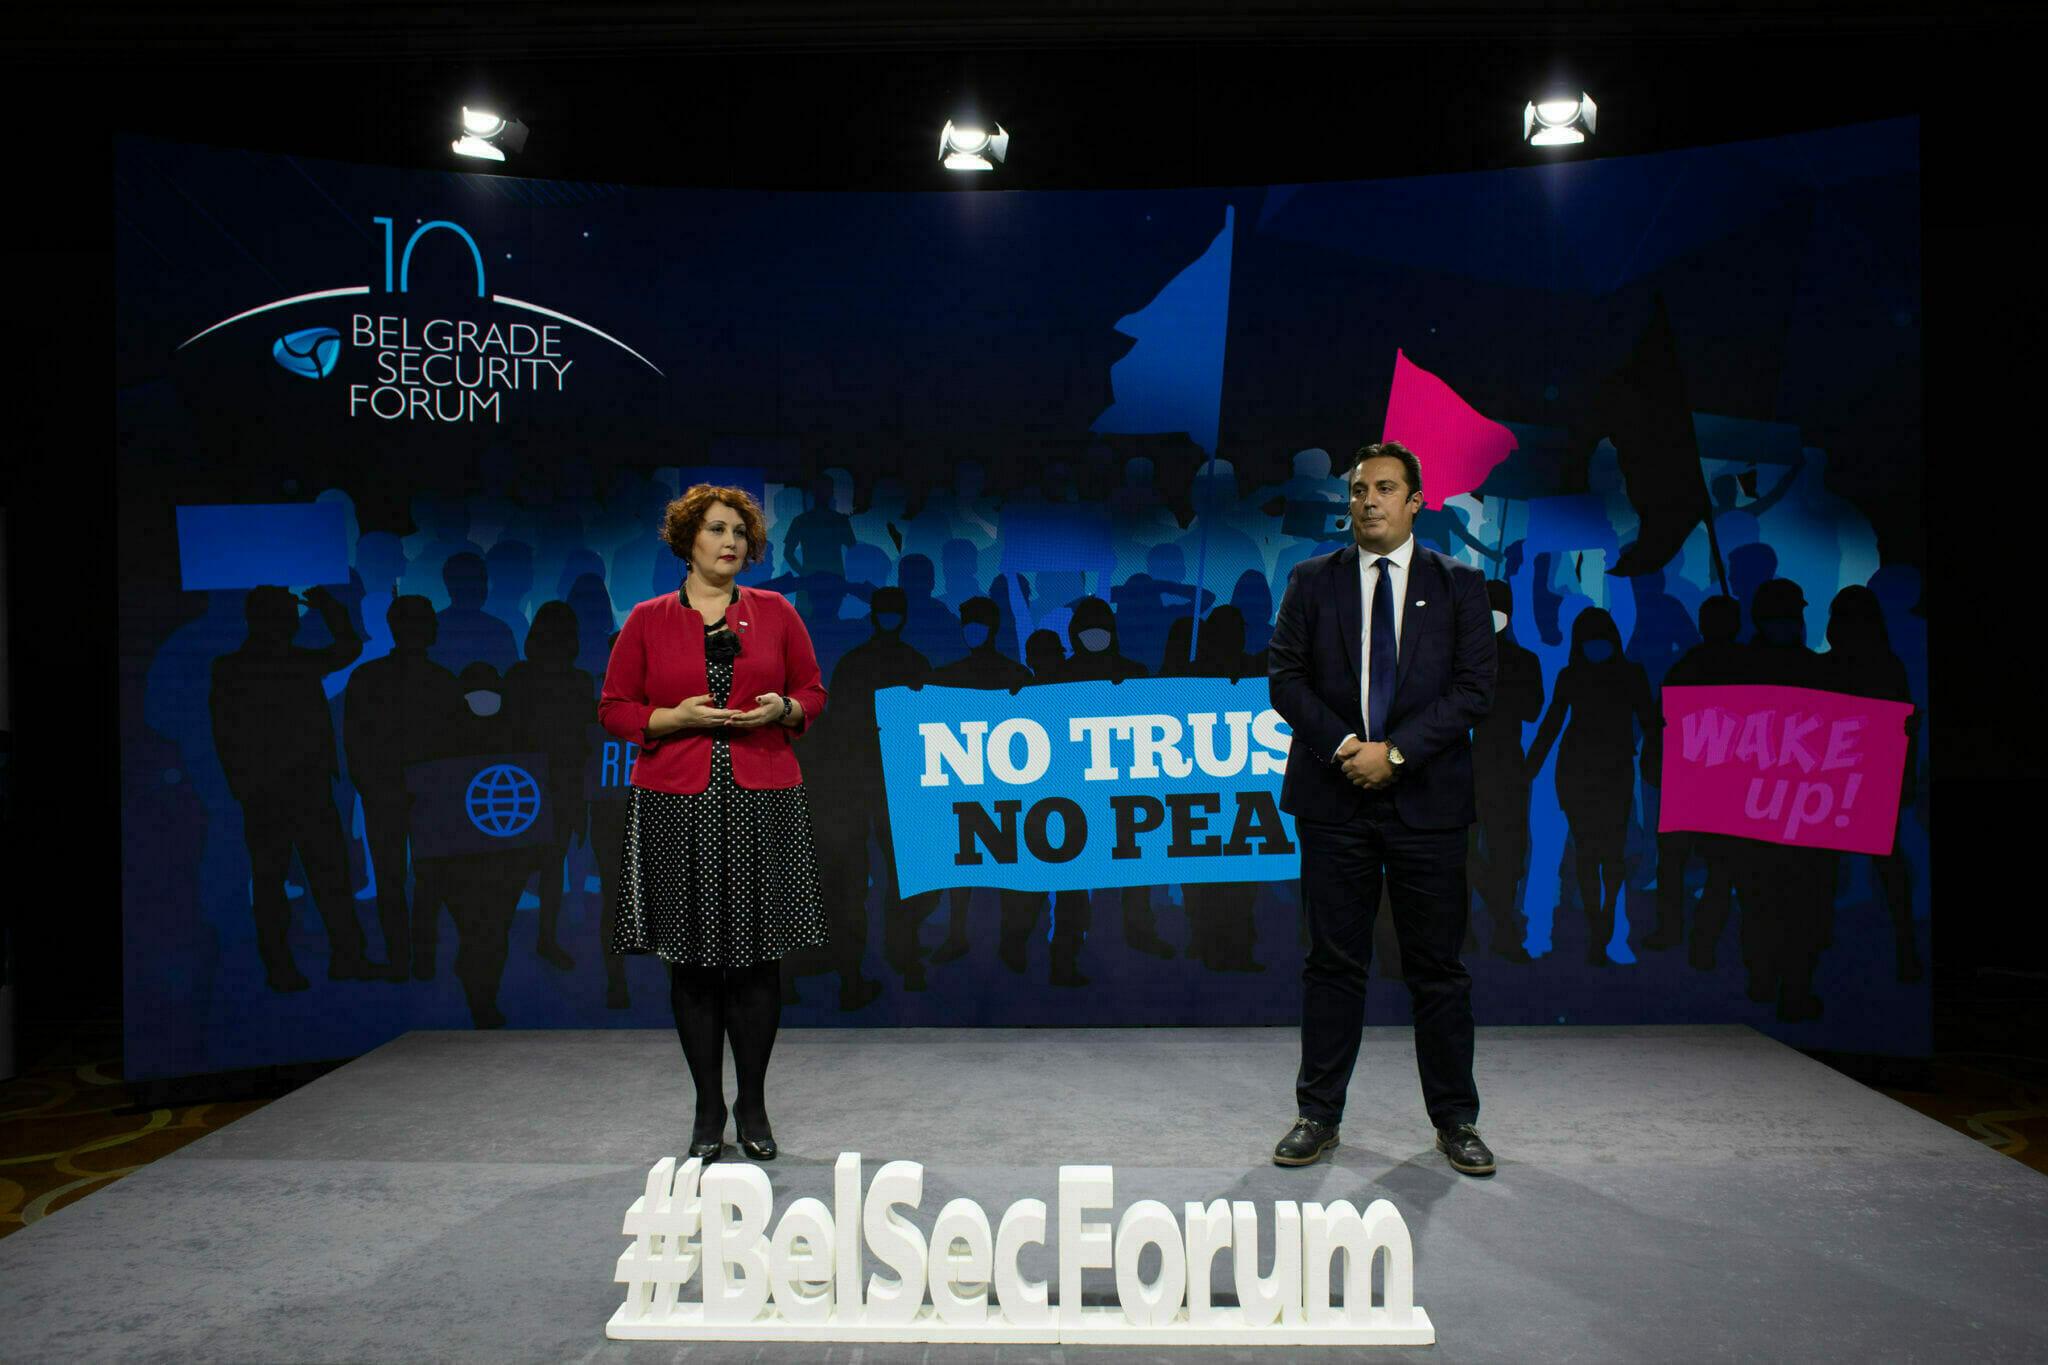 Deseti Beogradski bezbednosni forum zvanično je završen